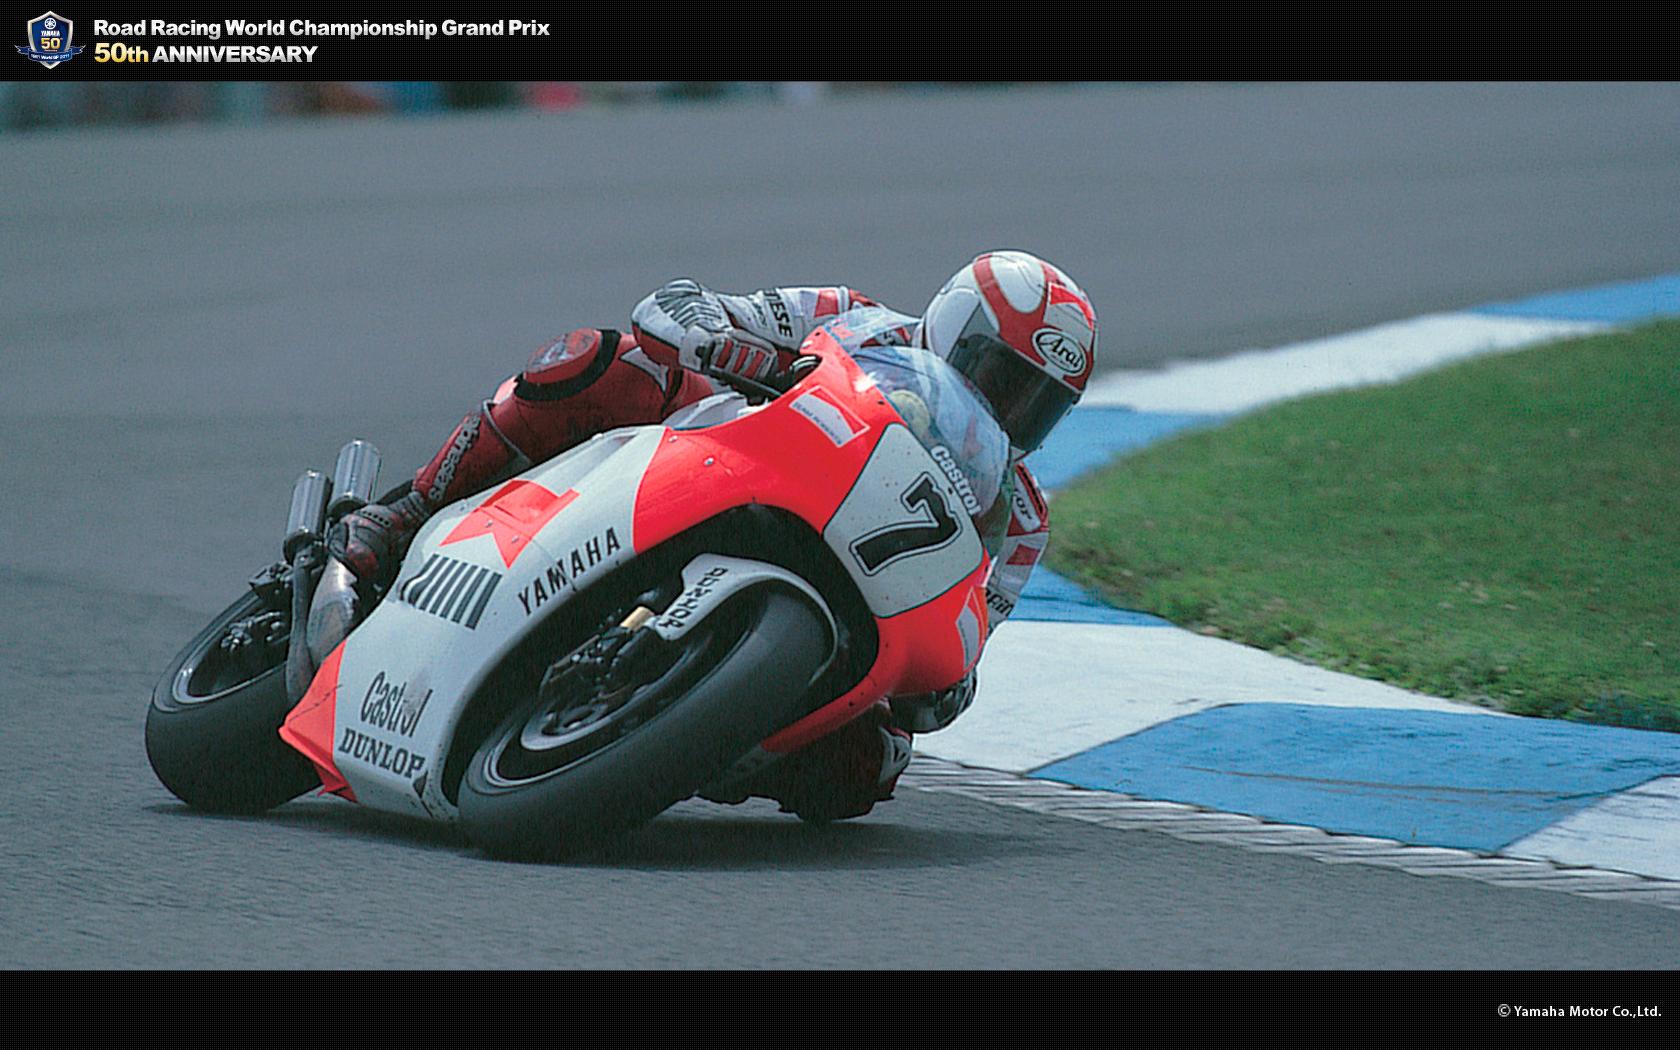 Luca Cadalora - レース | ヤマ...